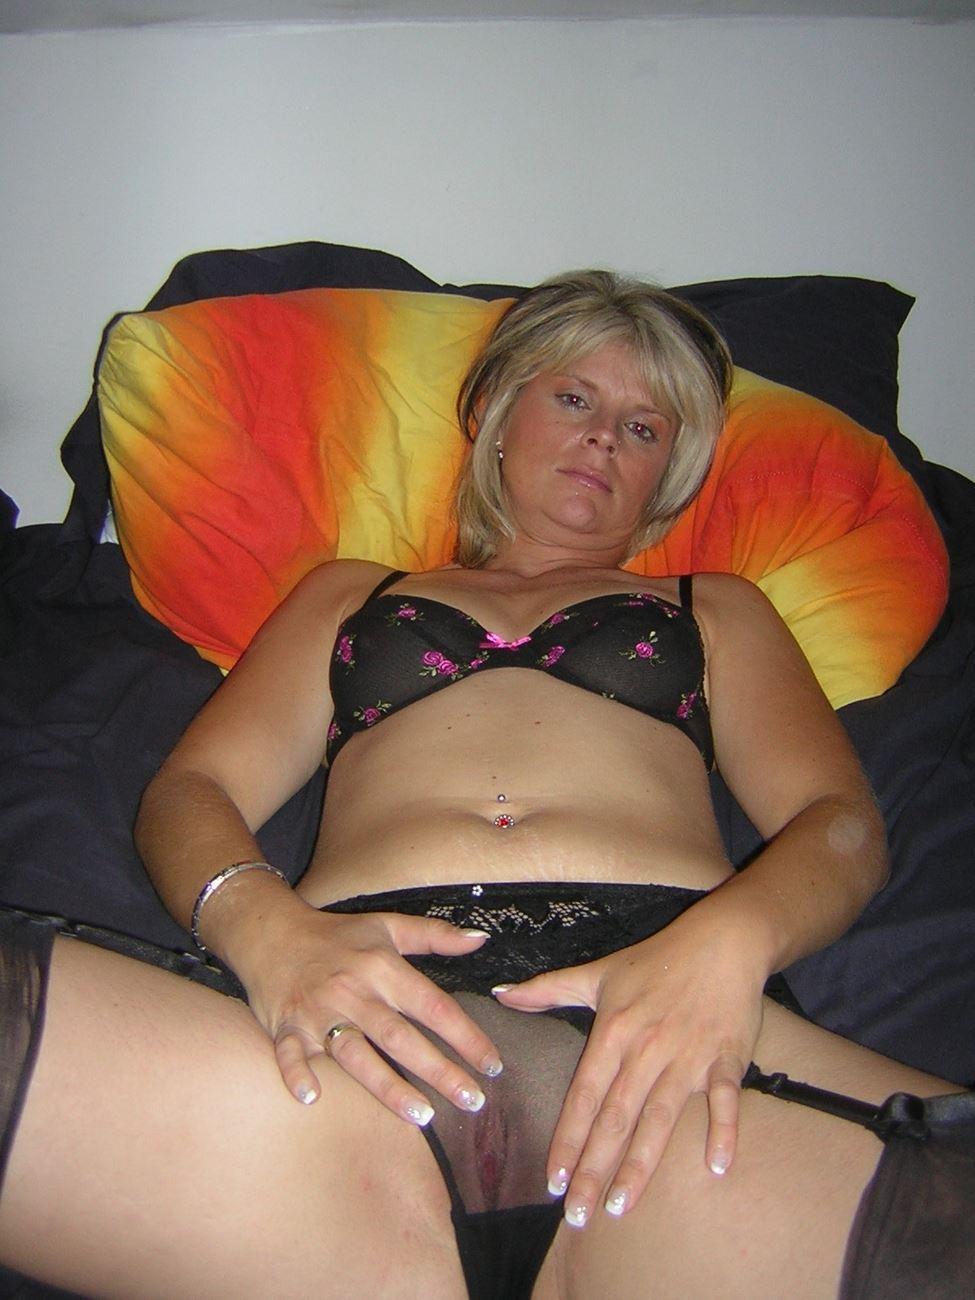 Hot sexy girls nude pics